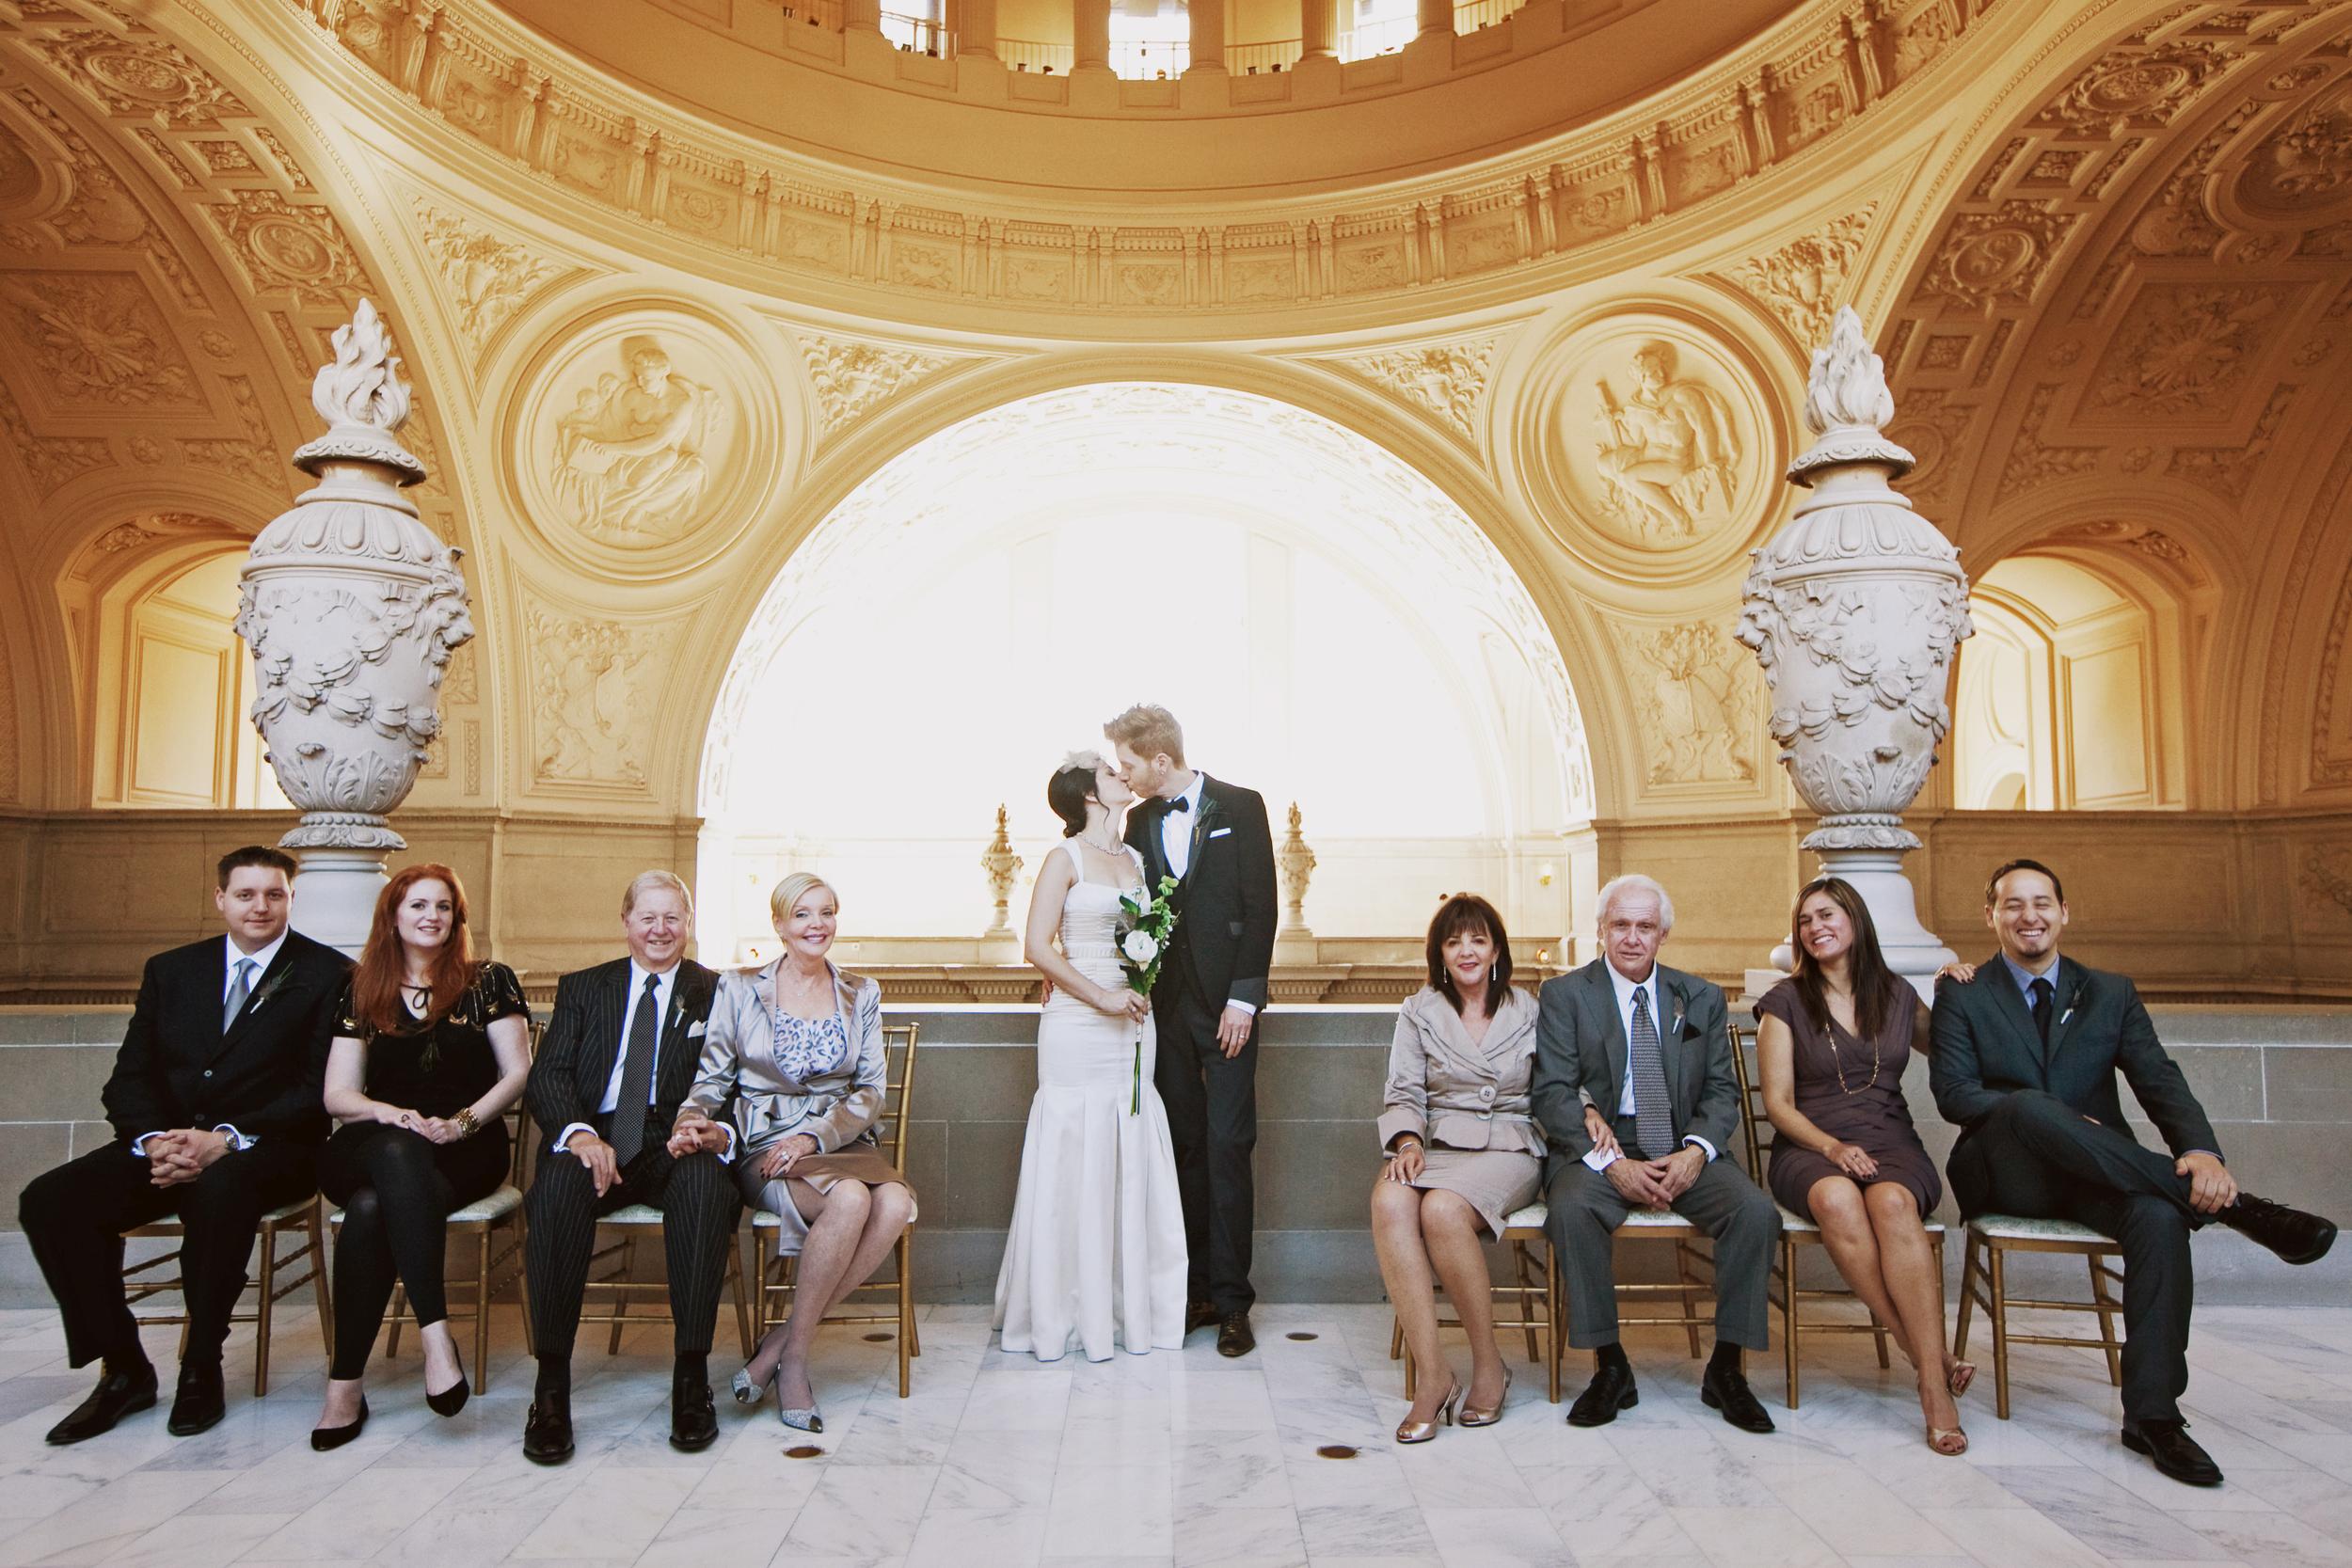 San_Francisco_City_Hall_Wedding_Photography_Cori_EB-14.JPG